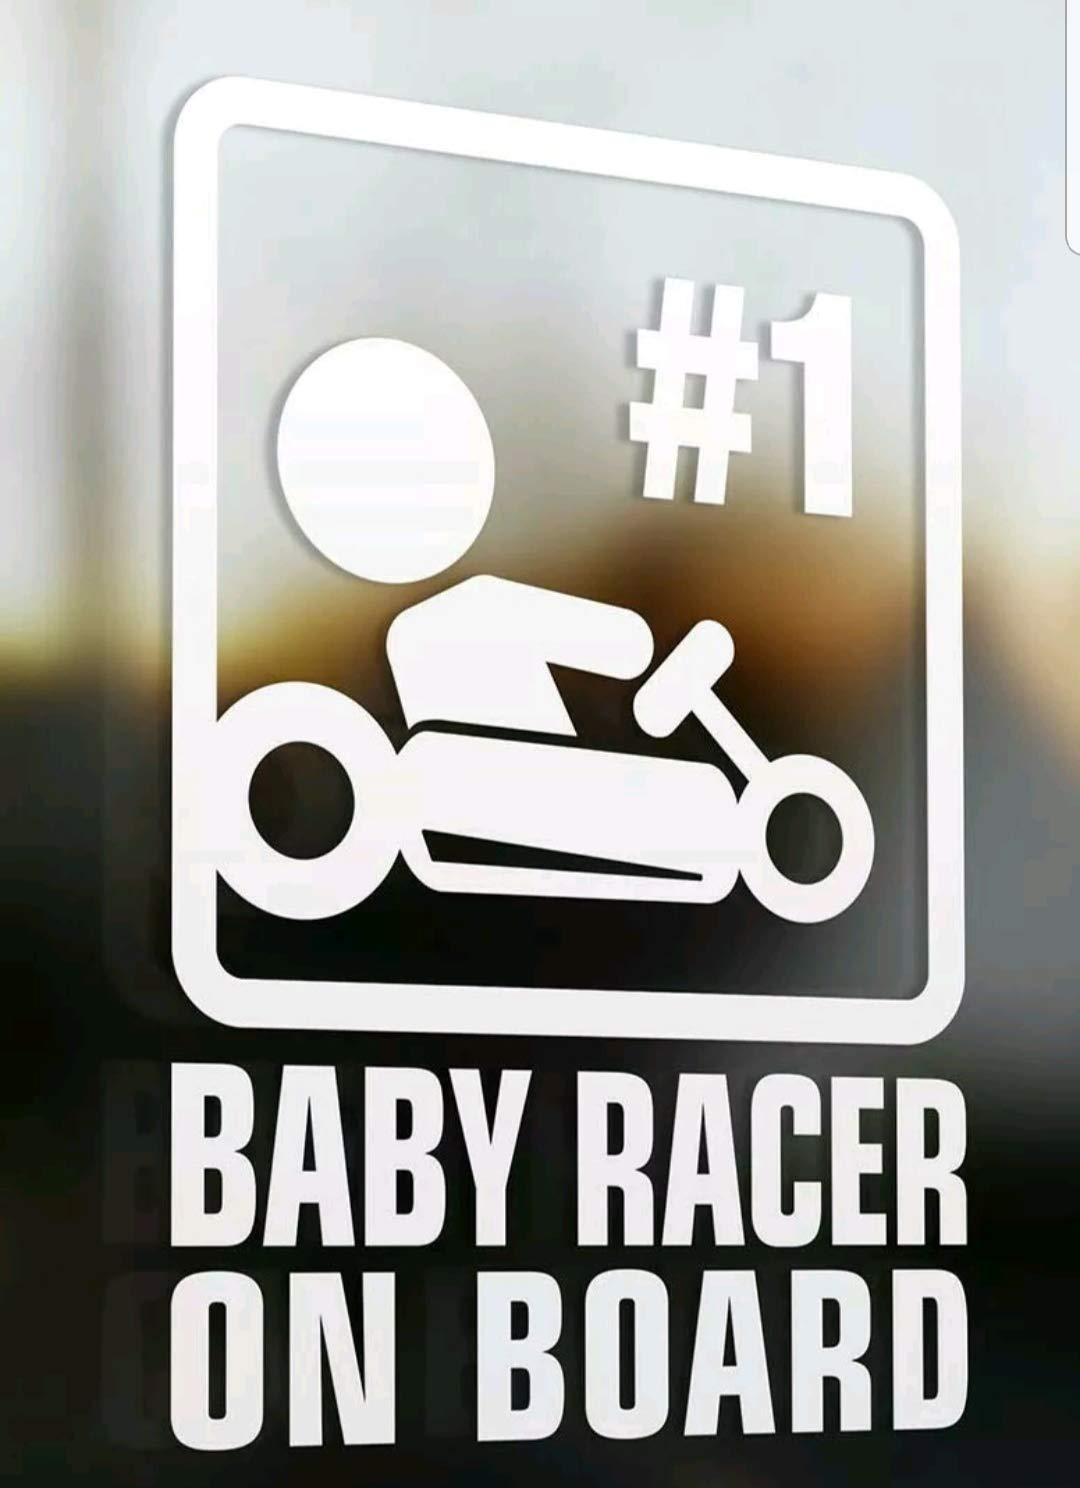 Baby racer on board - child car novelty window bumper van bike vinyl decal sticker